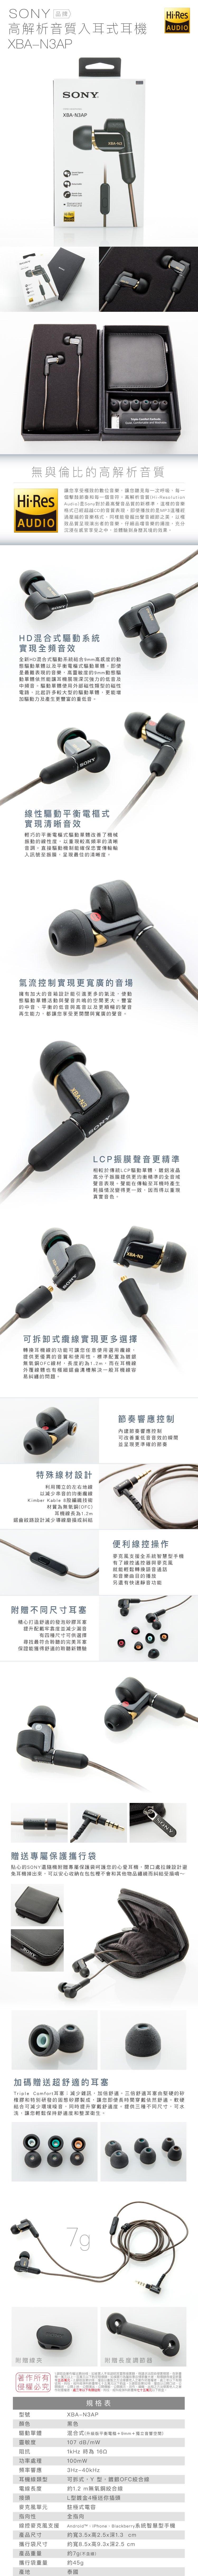 headset_32(W)